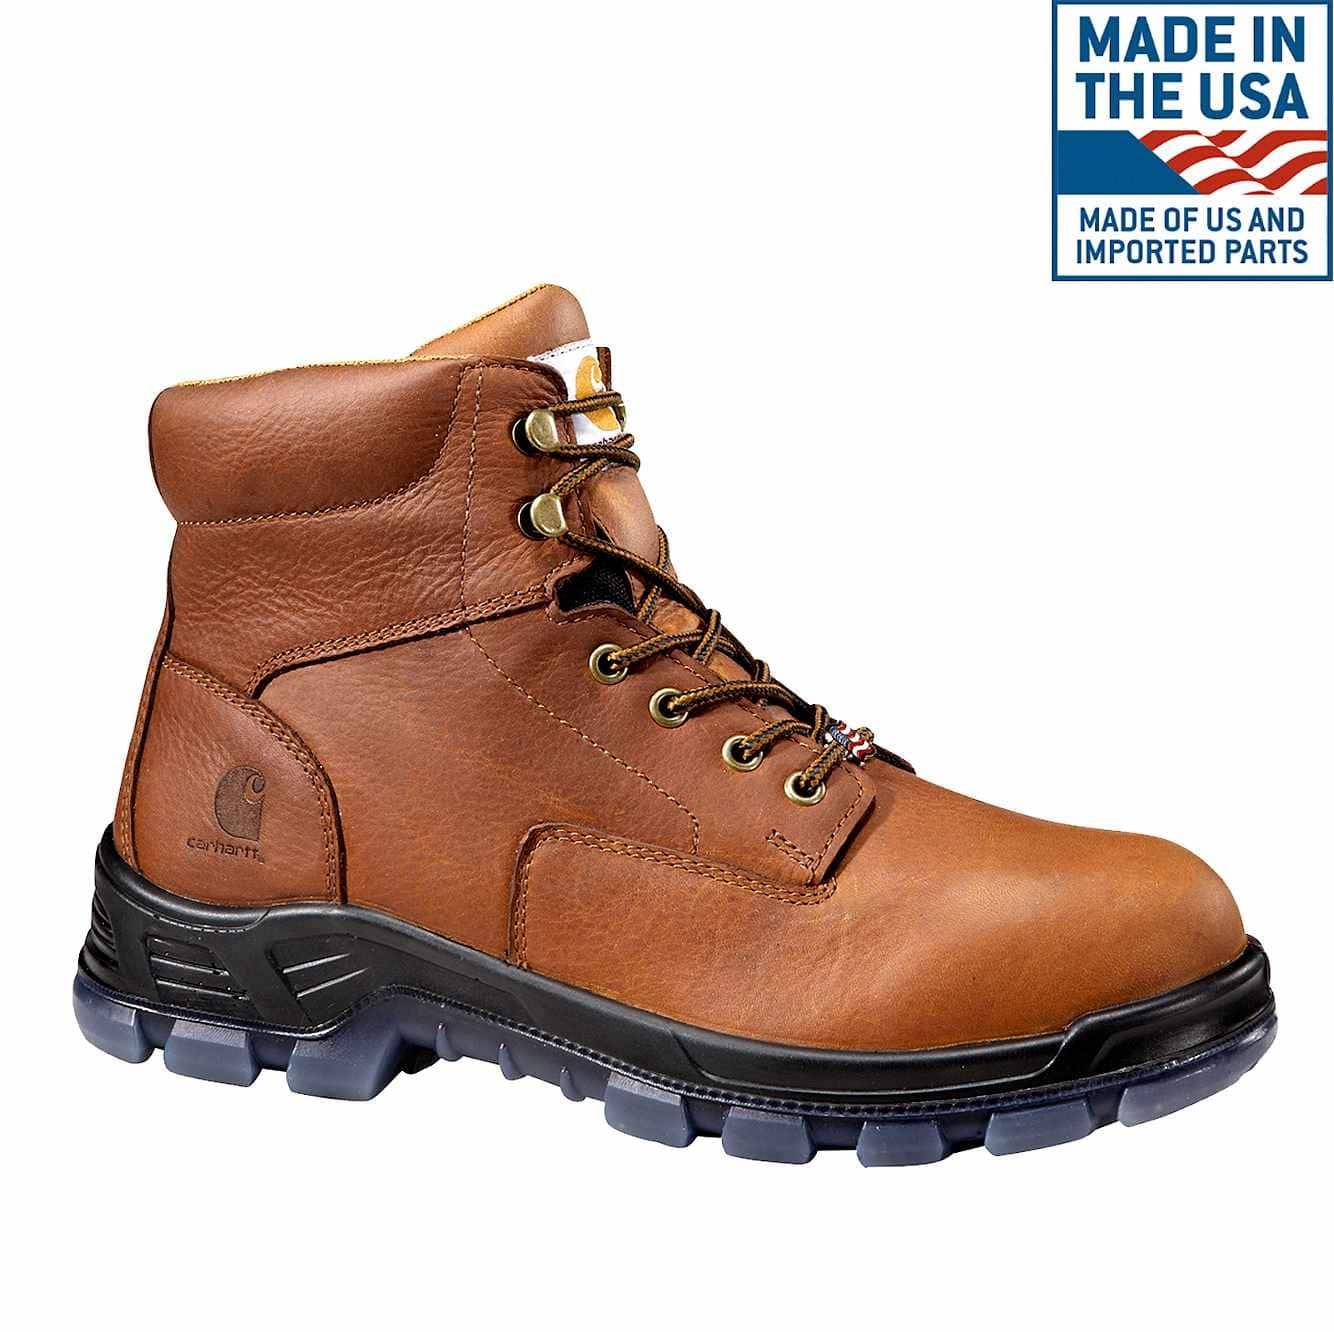 Hard Toe Work Boots